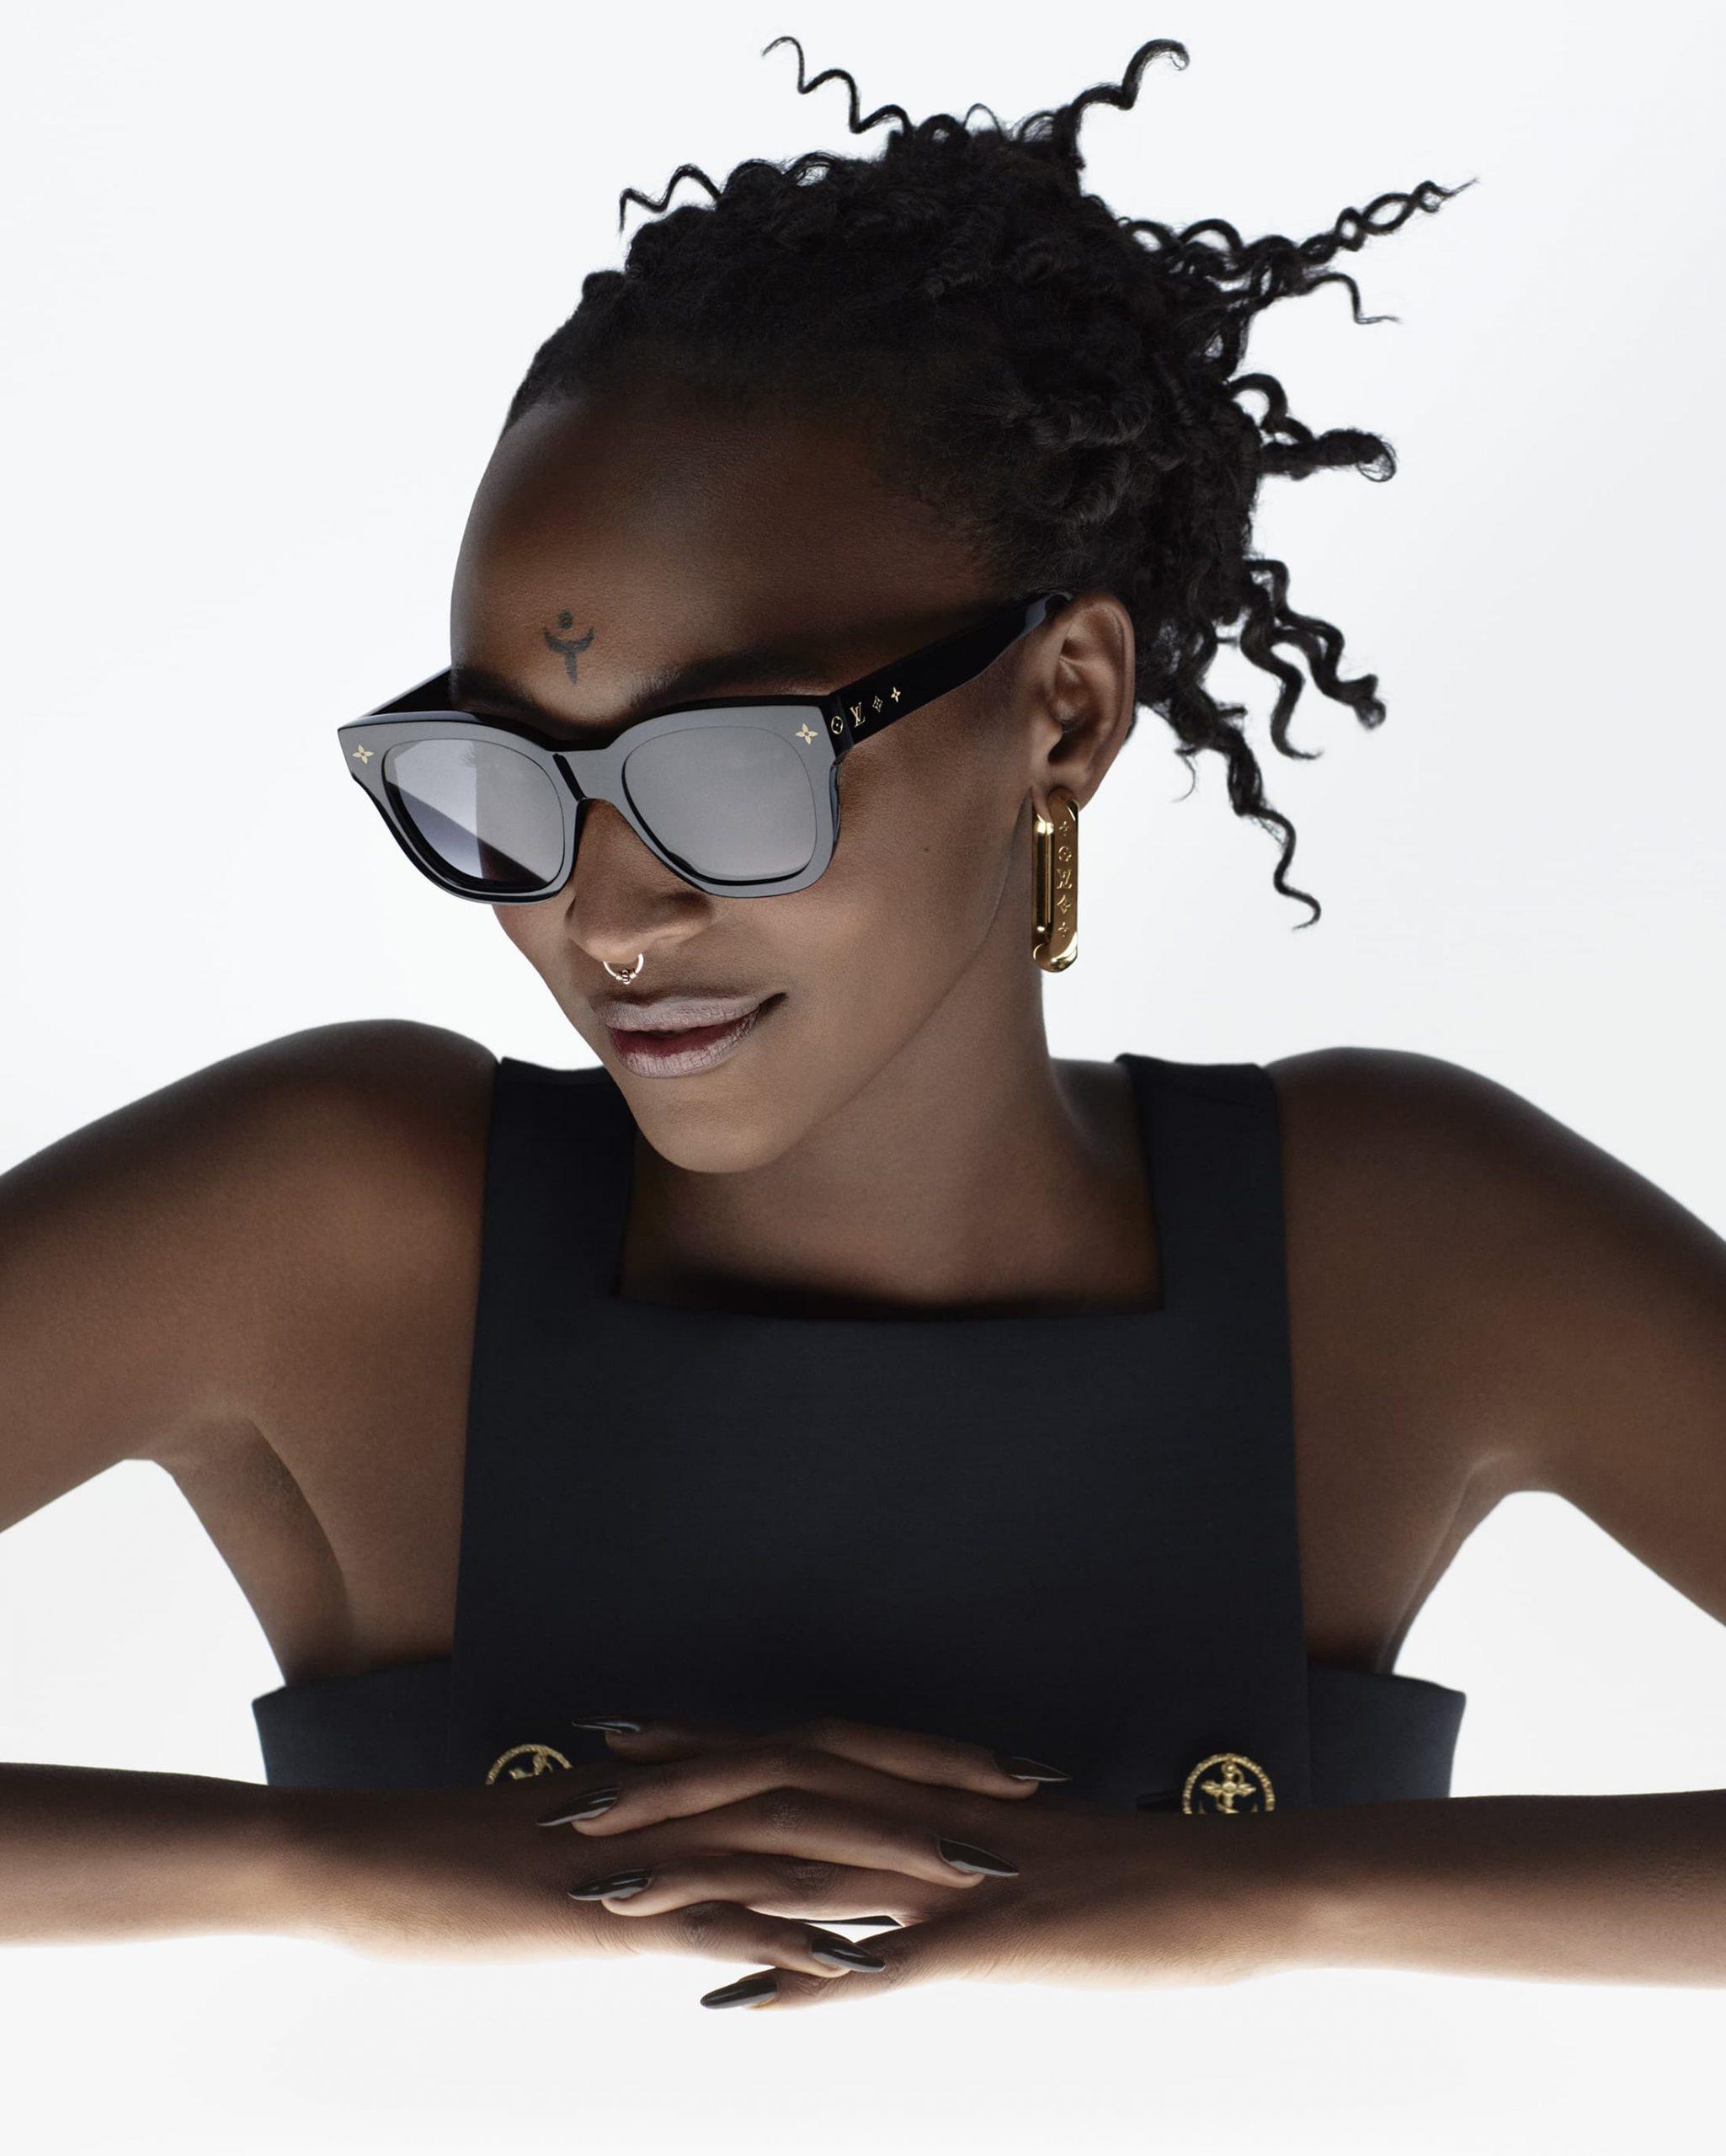 Louis Vuitton Sunglasses Summer 2021 Ad Campaign Photos